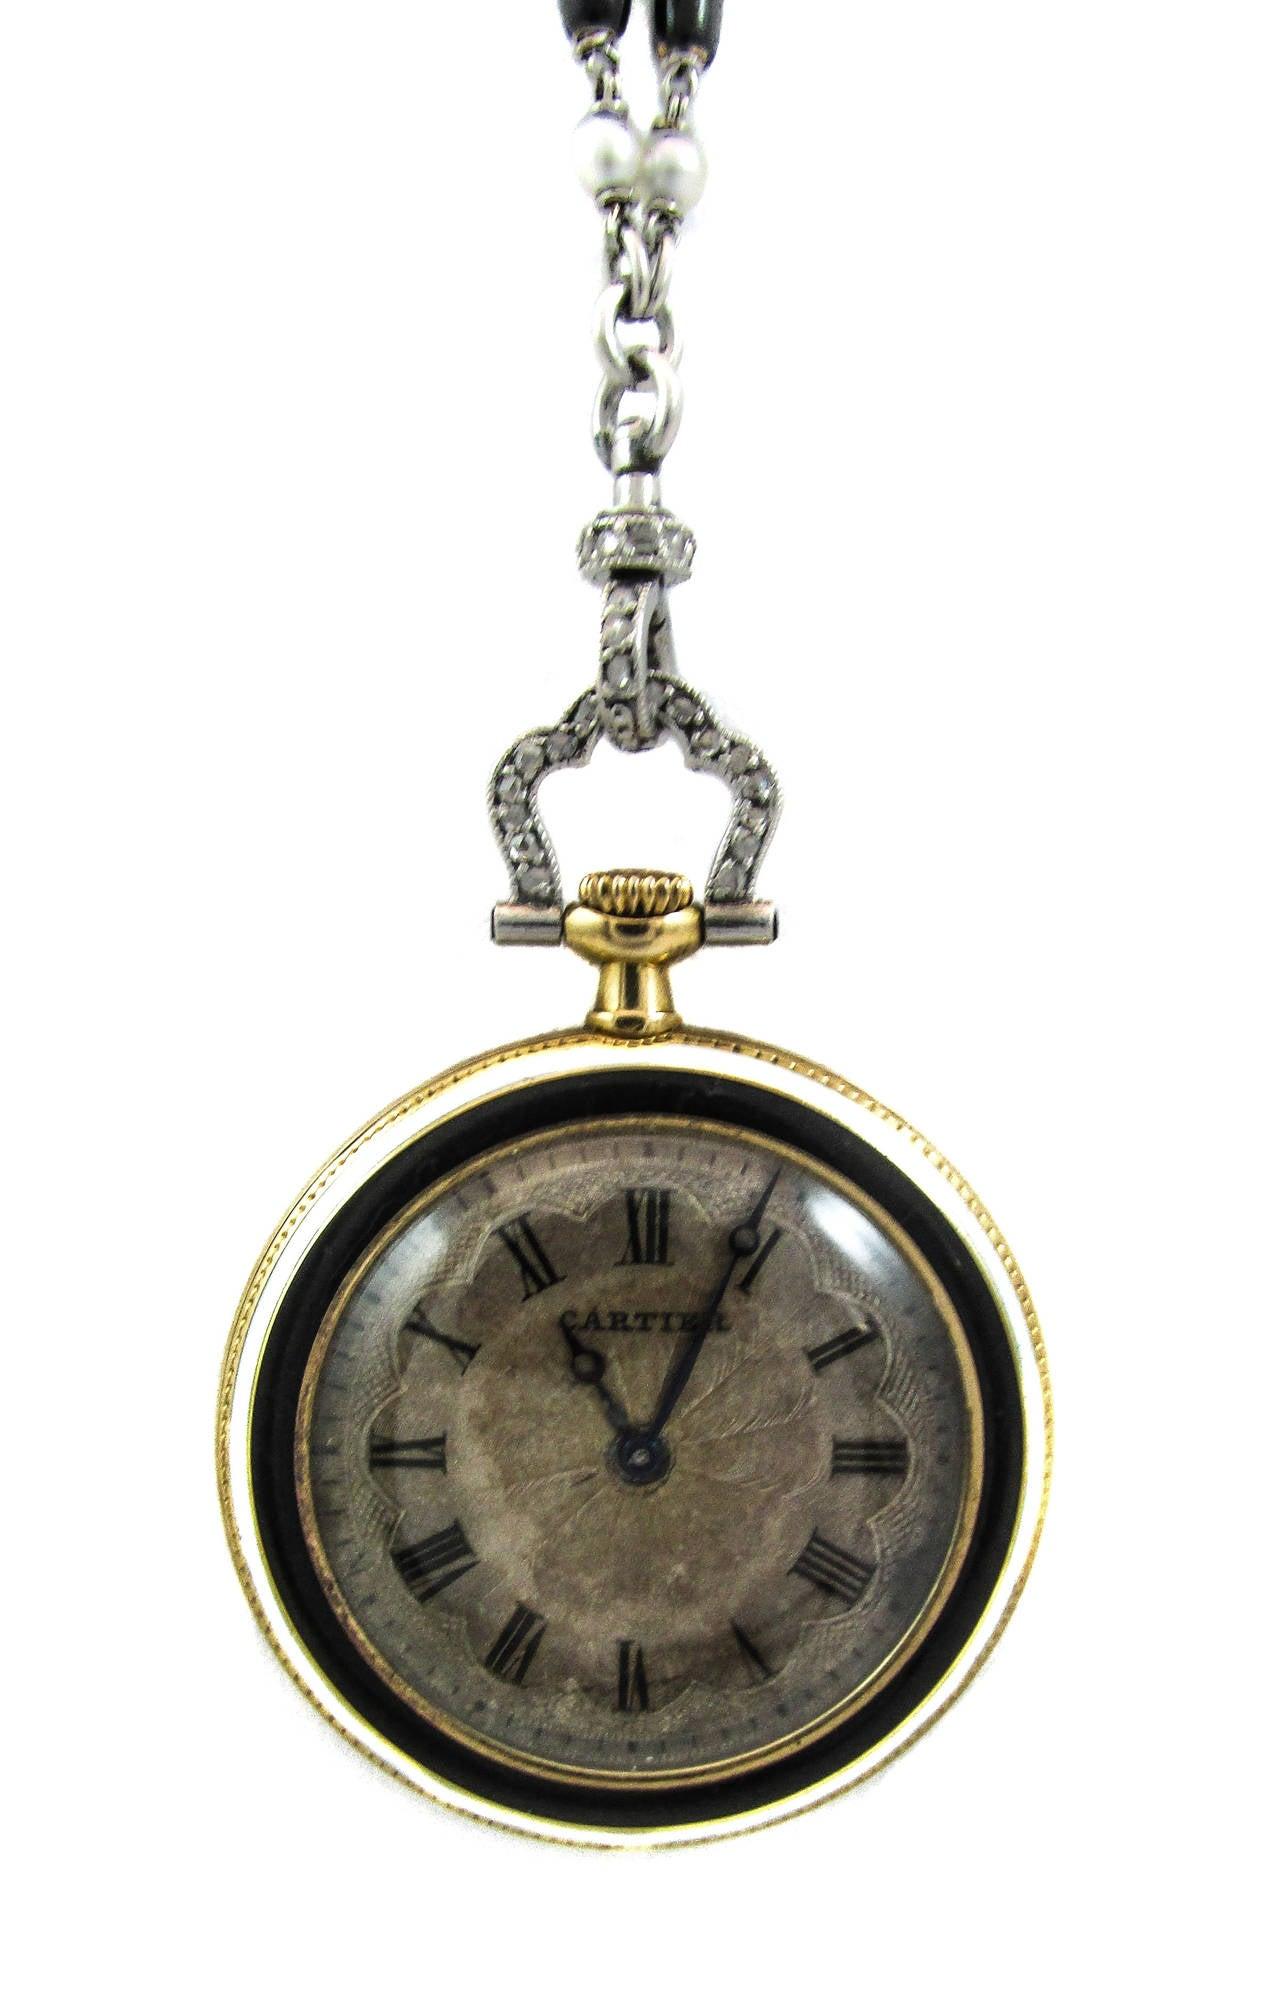 Cartier Platinum Yellow Gold Diamond Black Enamel Pendant Watch Necklace 5